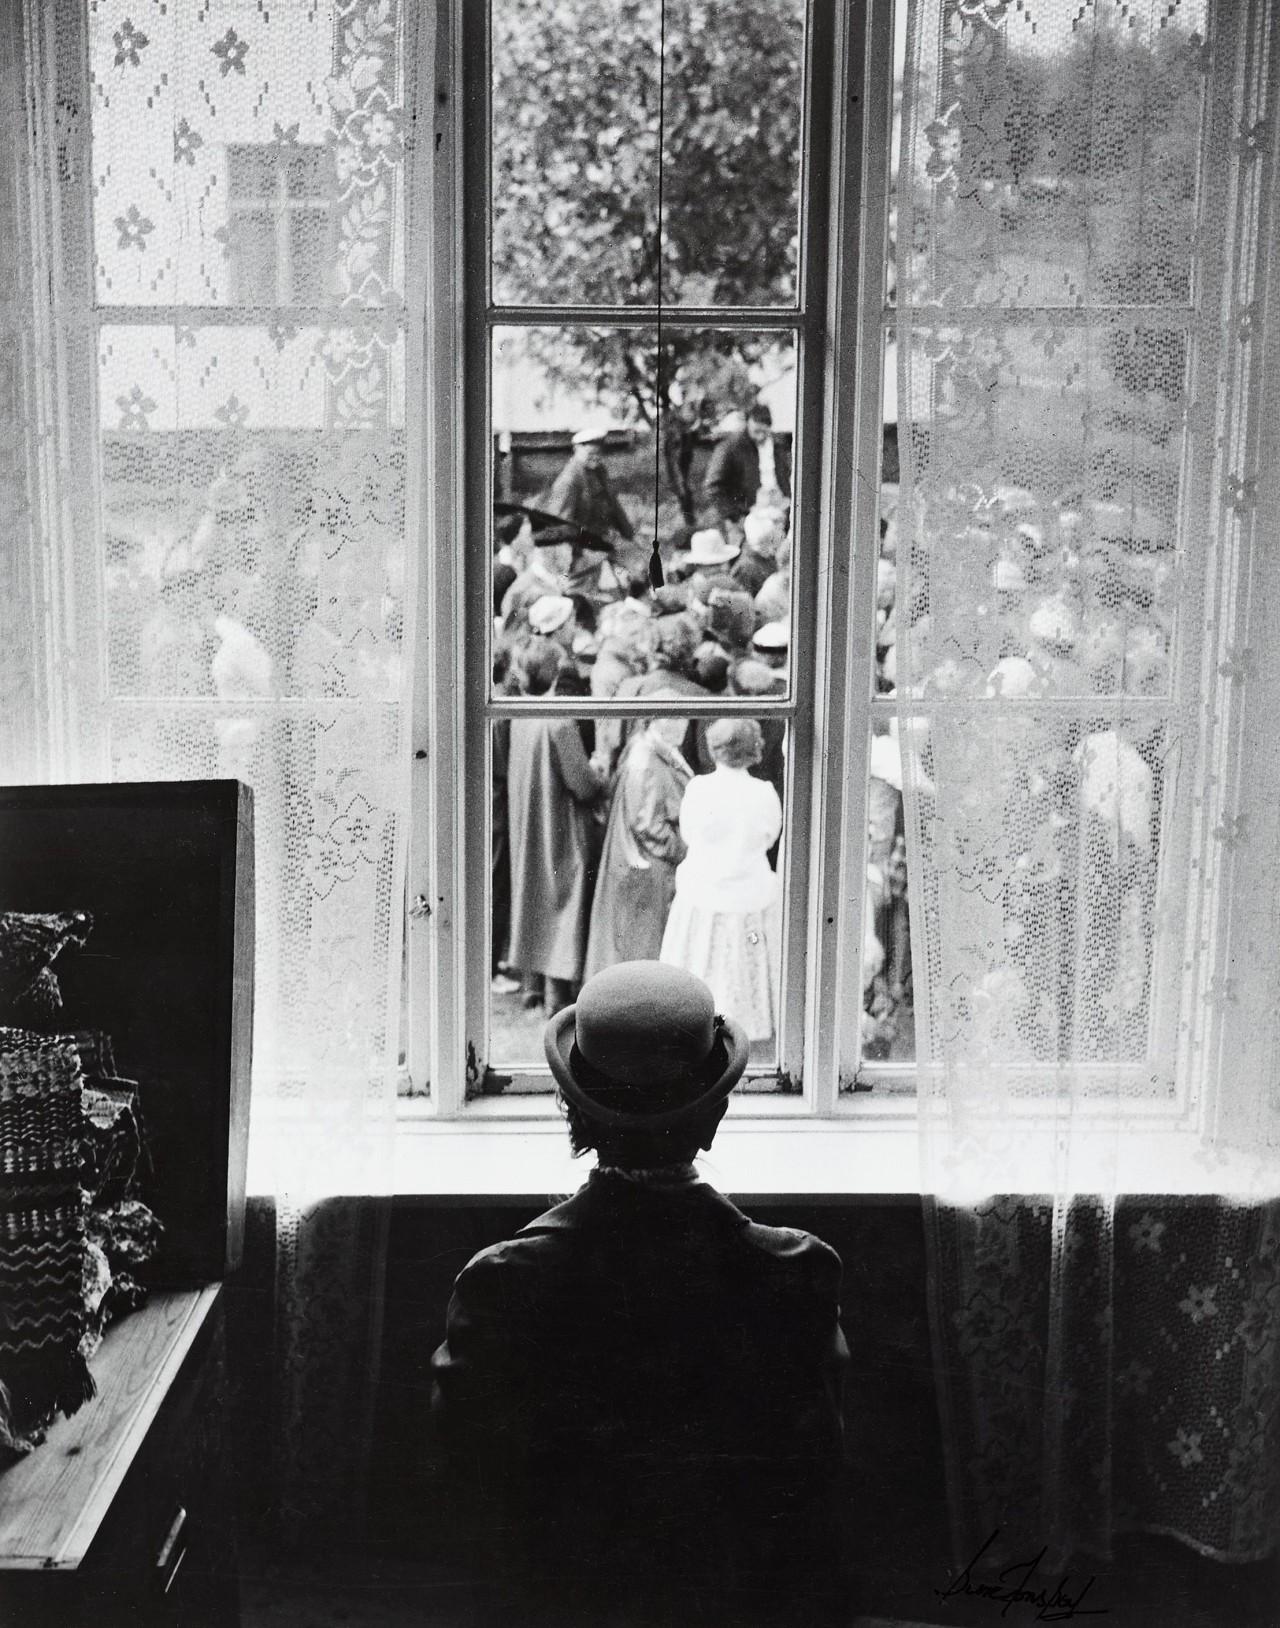 Толпа во вдворе, 1950-е. Автор Суне Юнссон